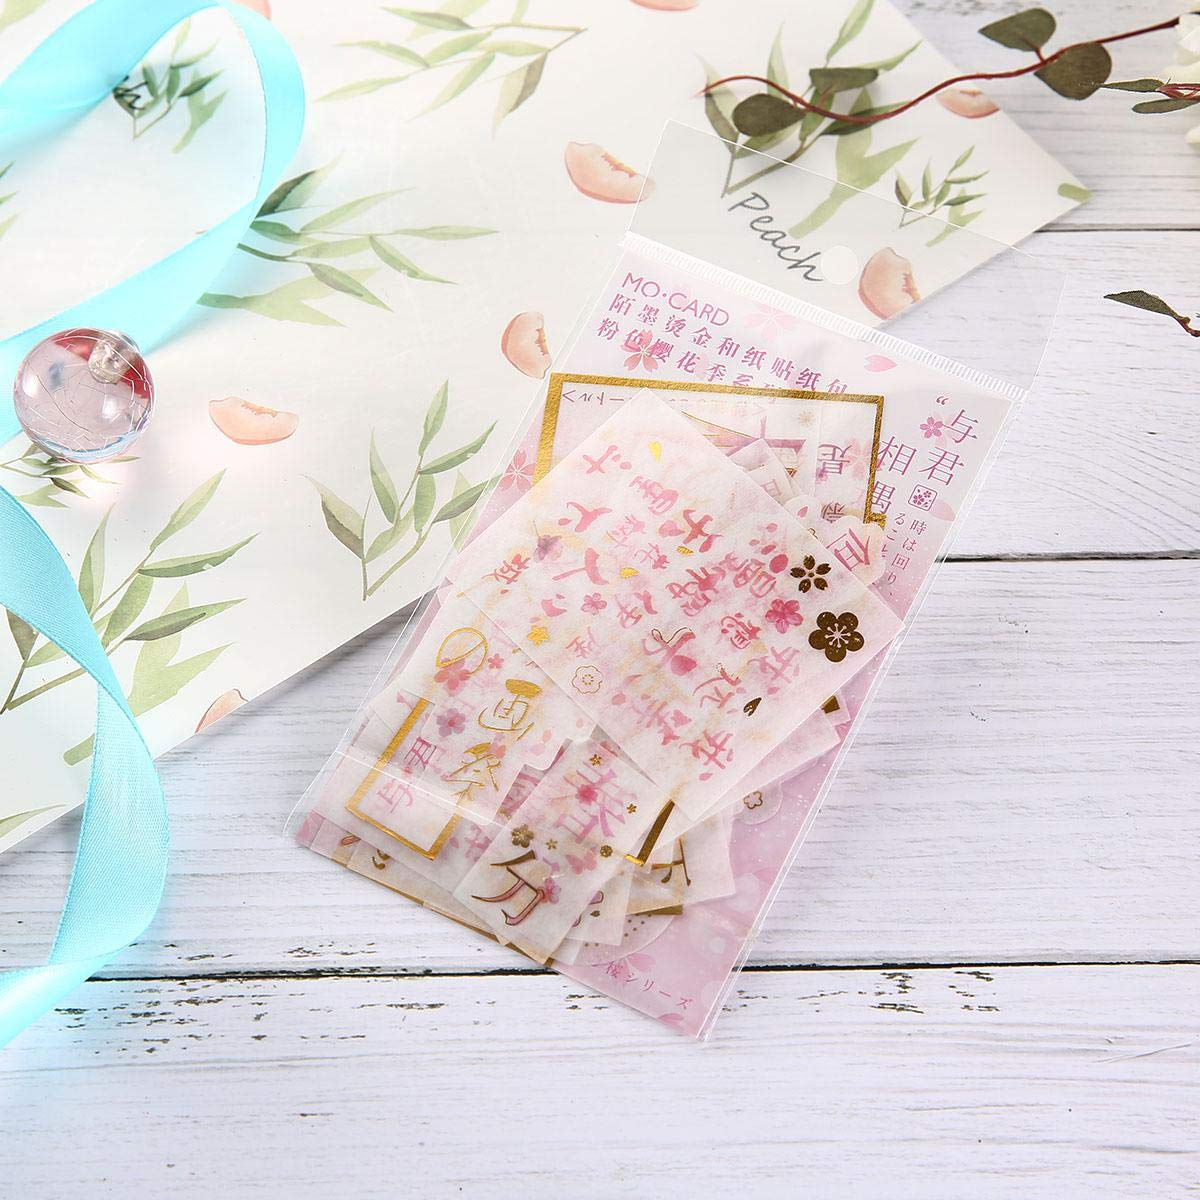 FOONEE Ephemera for Scrapbooking Letters Card Making 60 Pieces Cherry Blossom Series Vintage Ephemera Pack Journal Ephemera Card Stock for Notebook